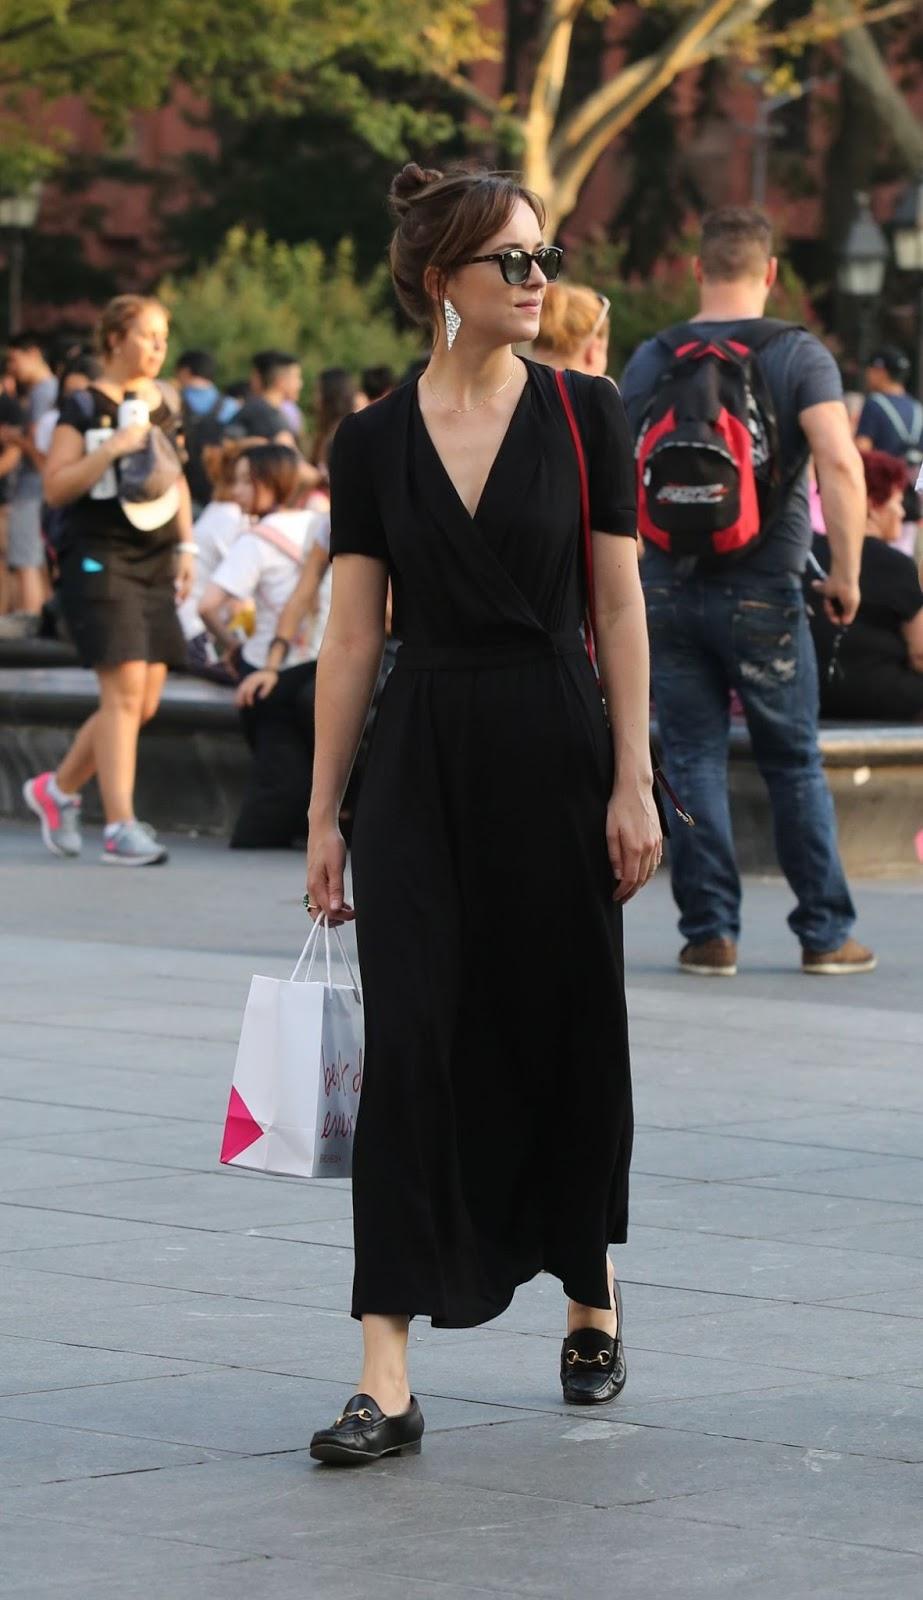 HQ Photos of Dakota Johnson Out Shopping In New York